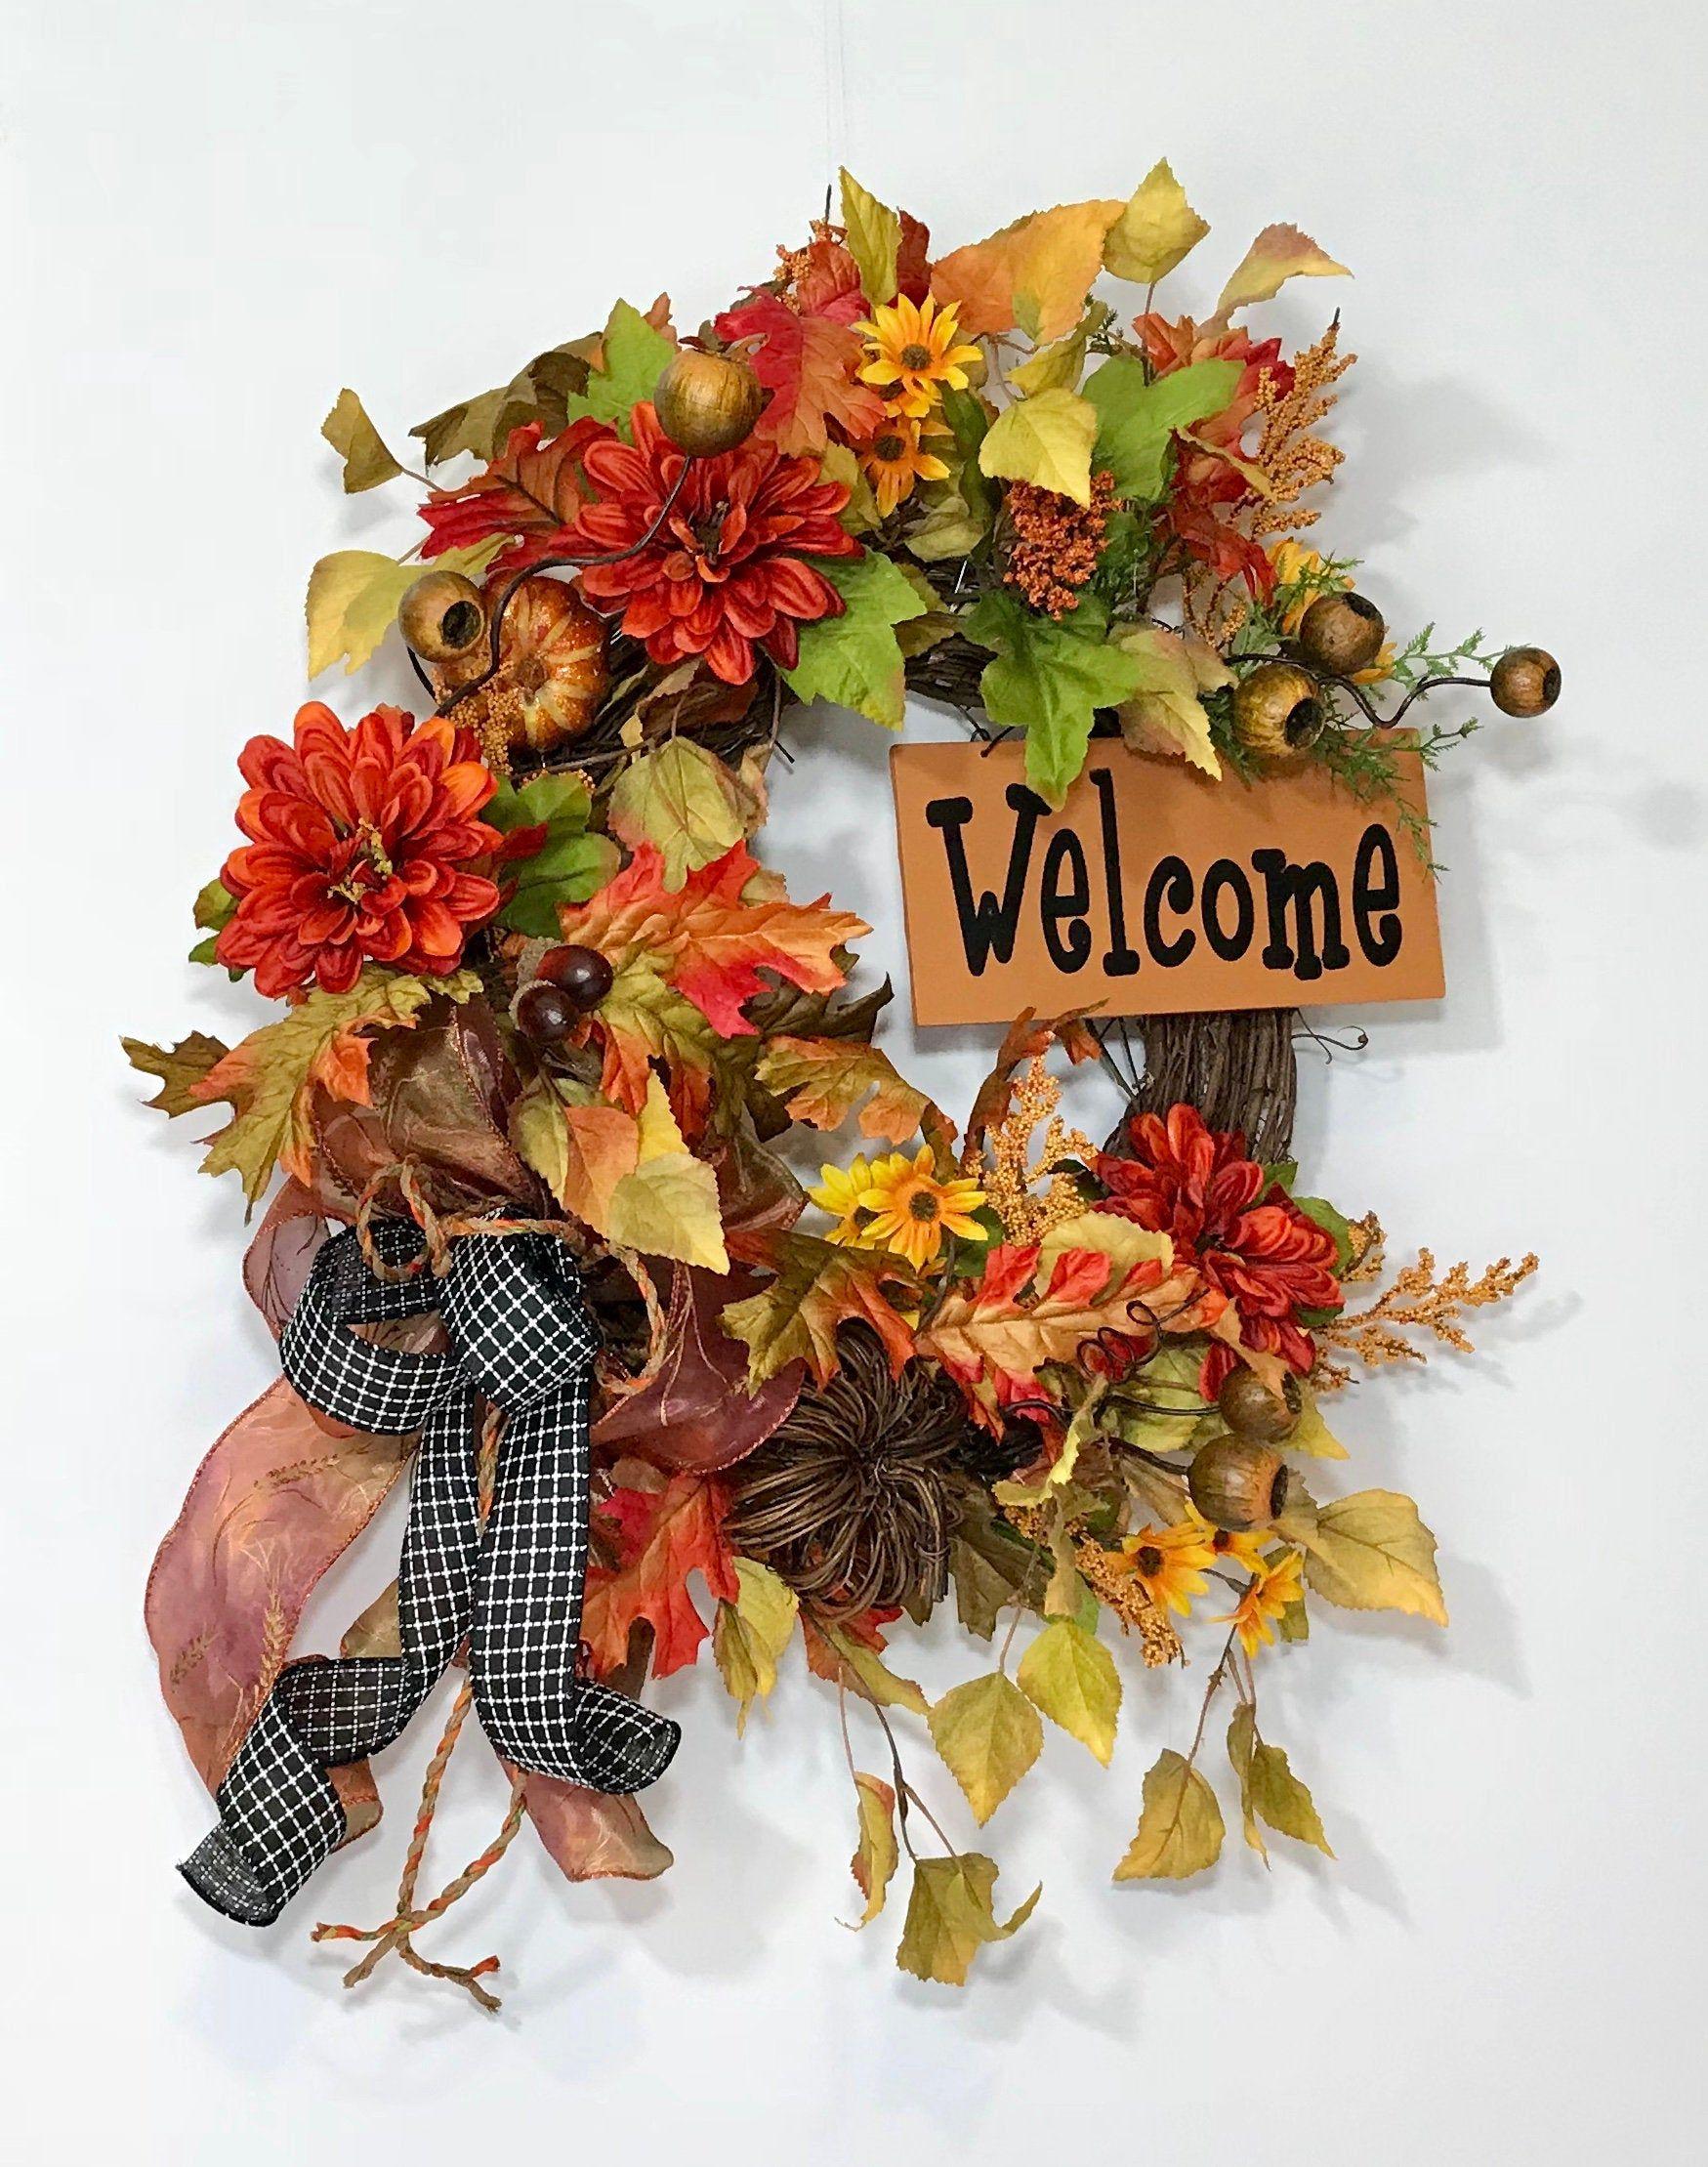 Autumn Wreath Decor Autumn Wreath Decoration Fall Grapevine Wreath Happy Halloween Sign Halloween Wreath For The Front Door Fall Decor